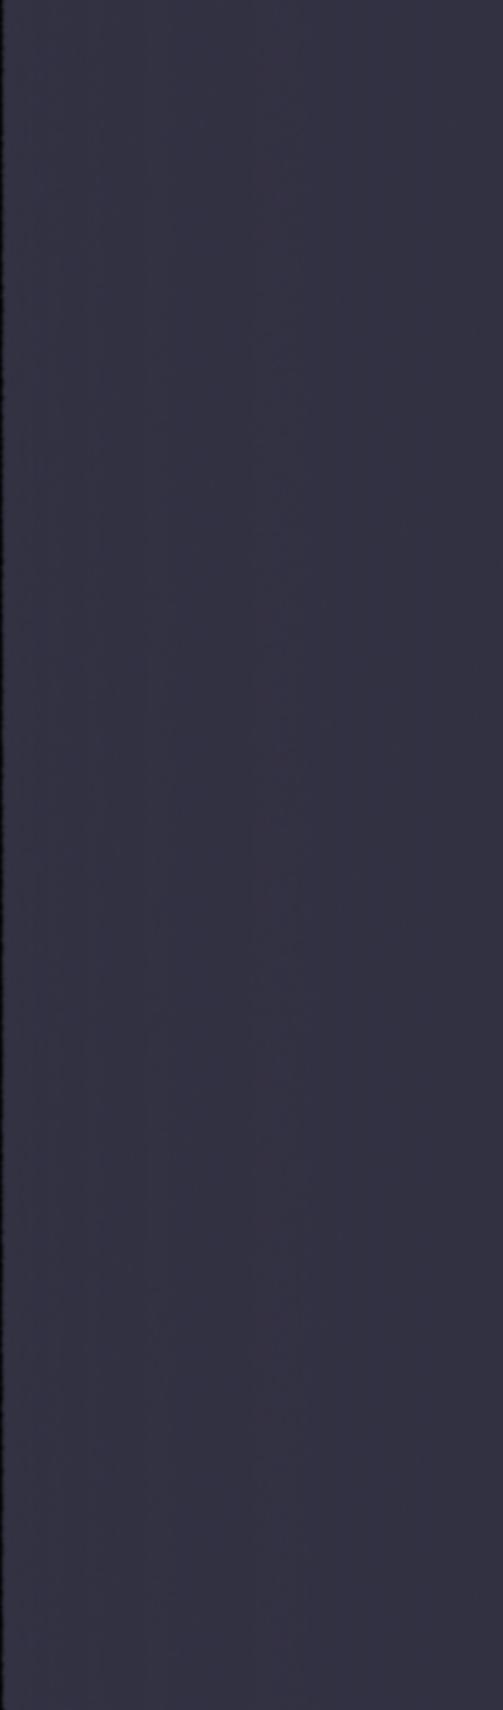 Dark Blue Gradient.png